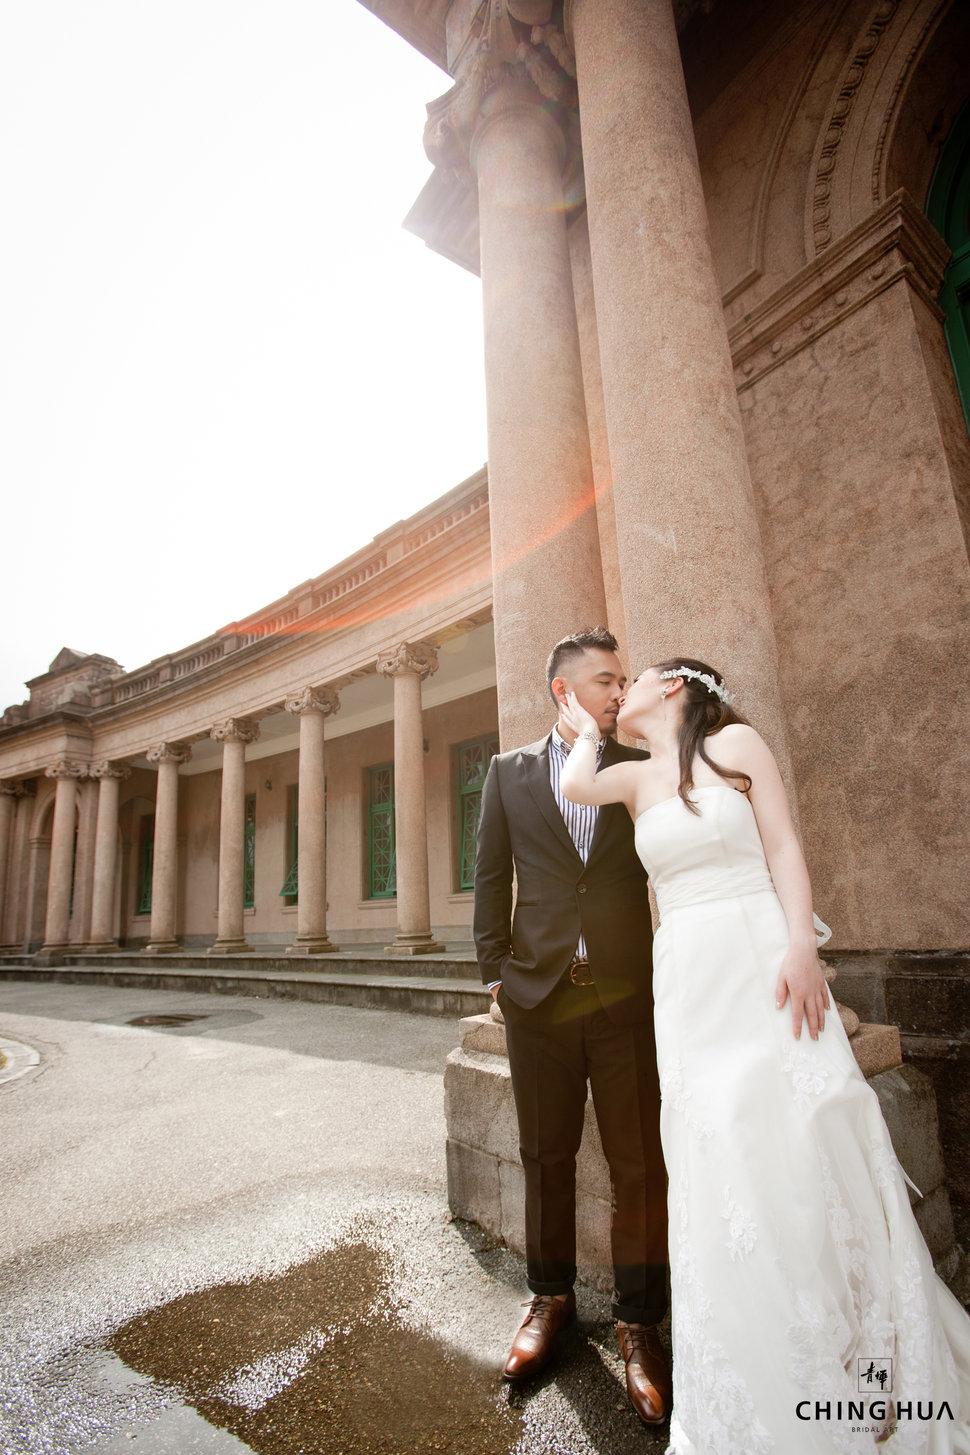 (編號:376892) - 青樺婚紗CHINGHUA - 結婚吧